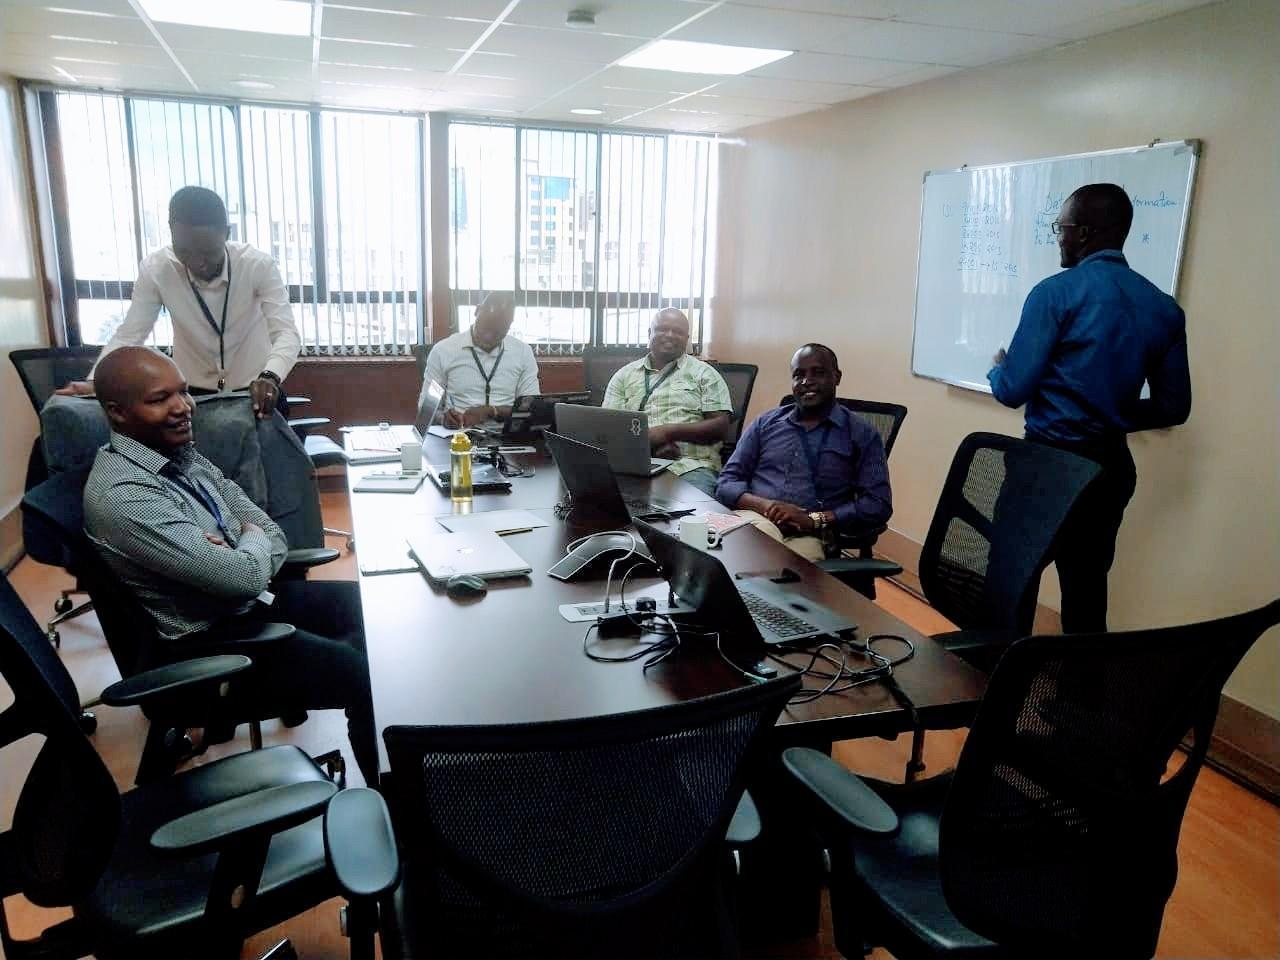 ISO 27001 at Digital Divide Data